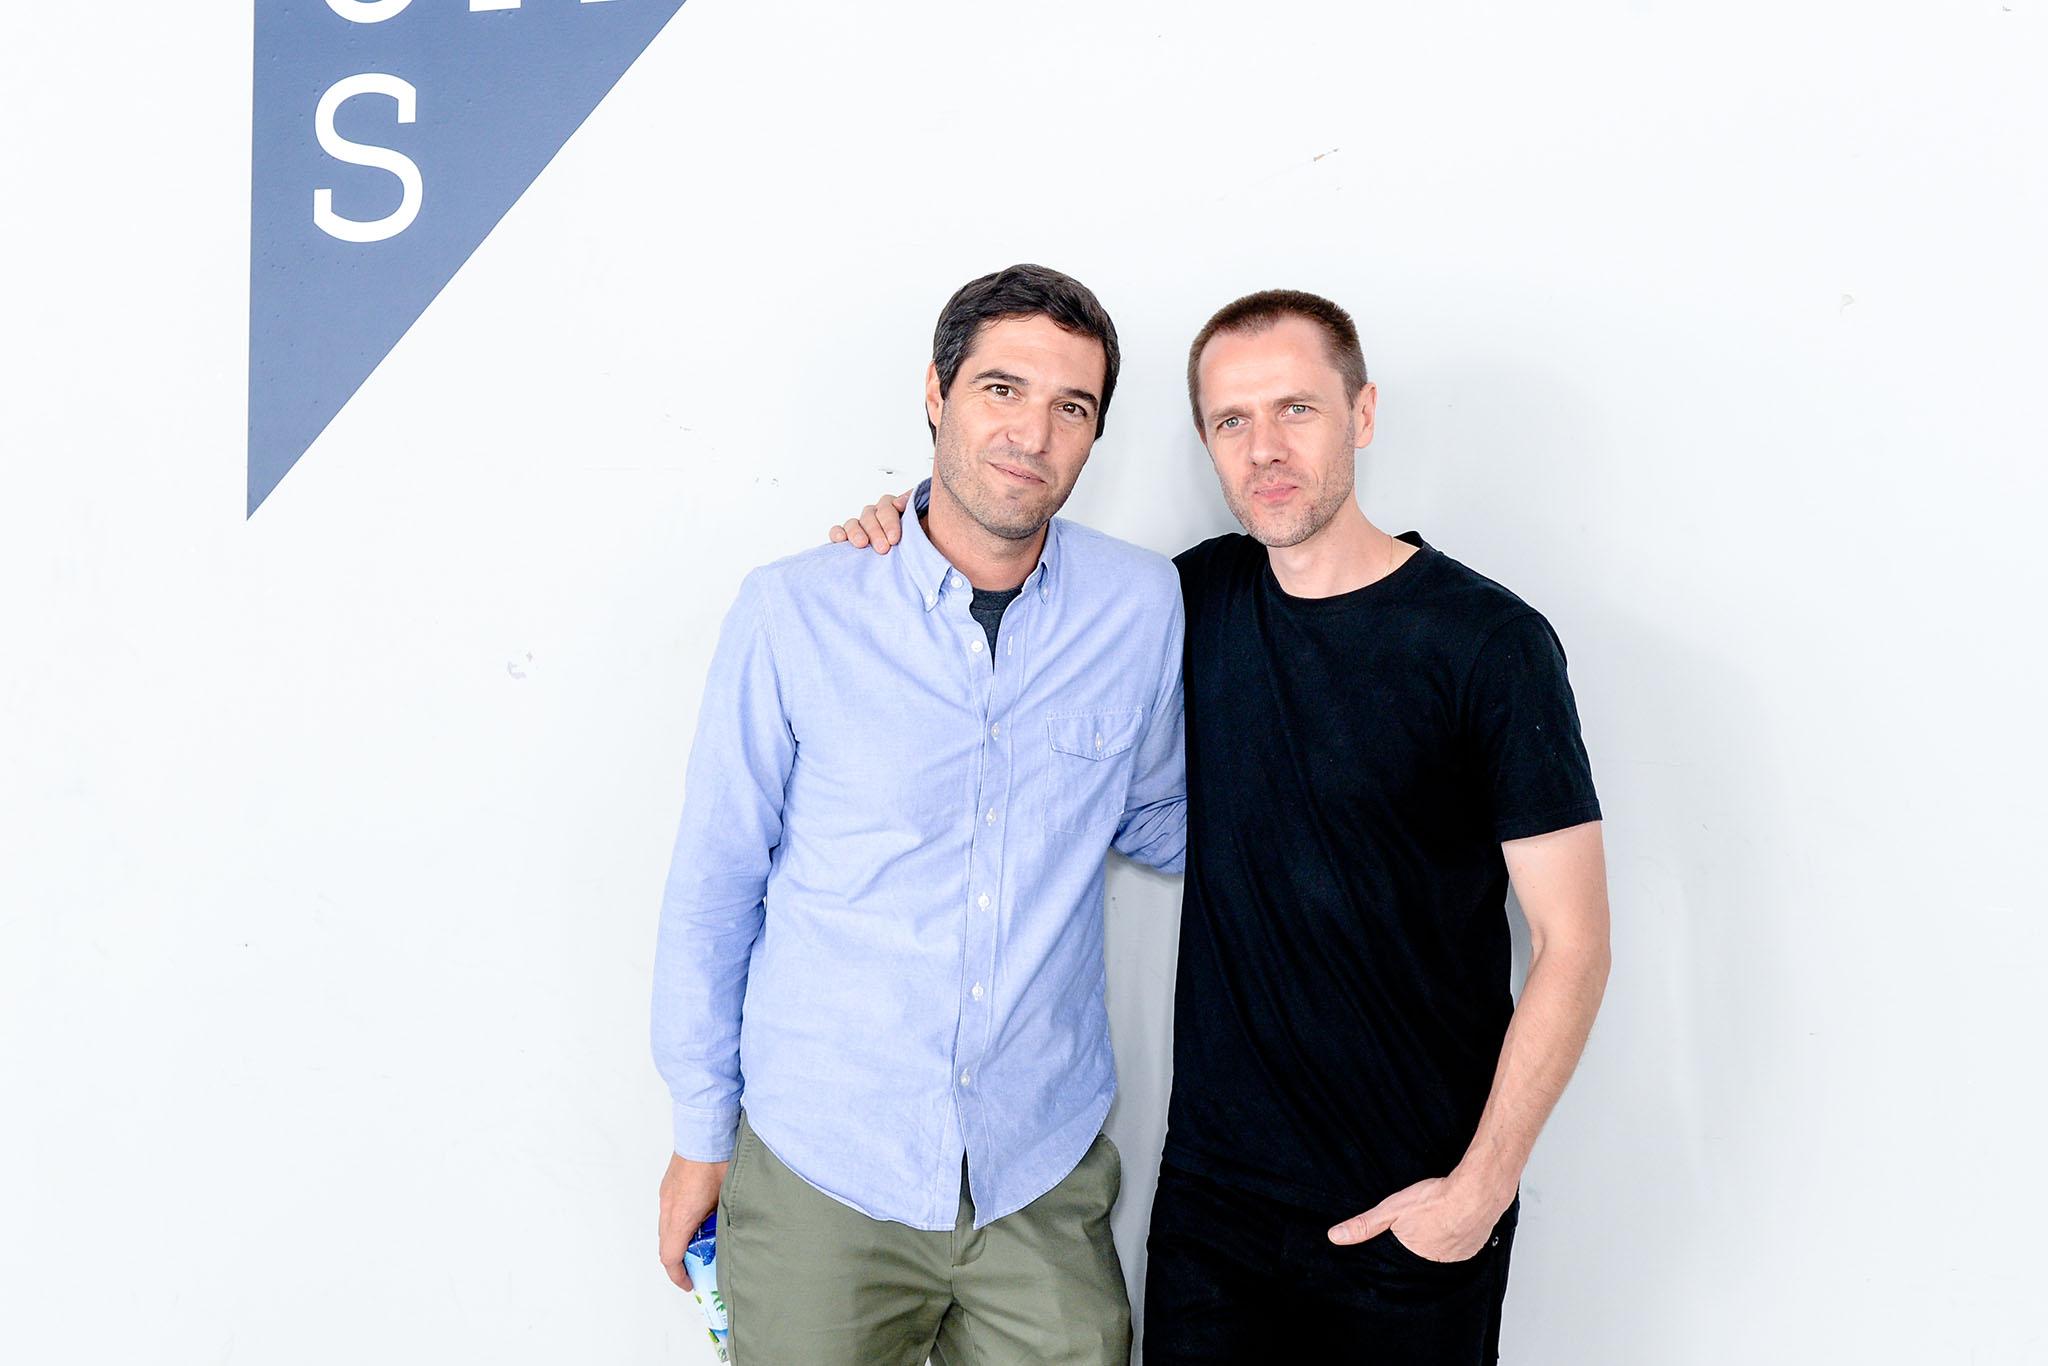 Ben Pruess, Tim CoppensUAS Collection 01 presentation, Fulton Market Building, New York Fashion Week, USA - 15 Sep 2016